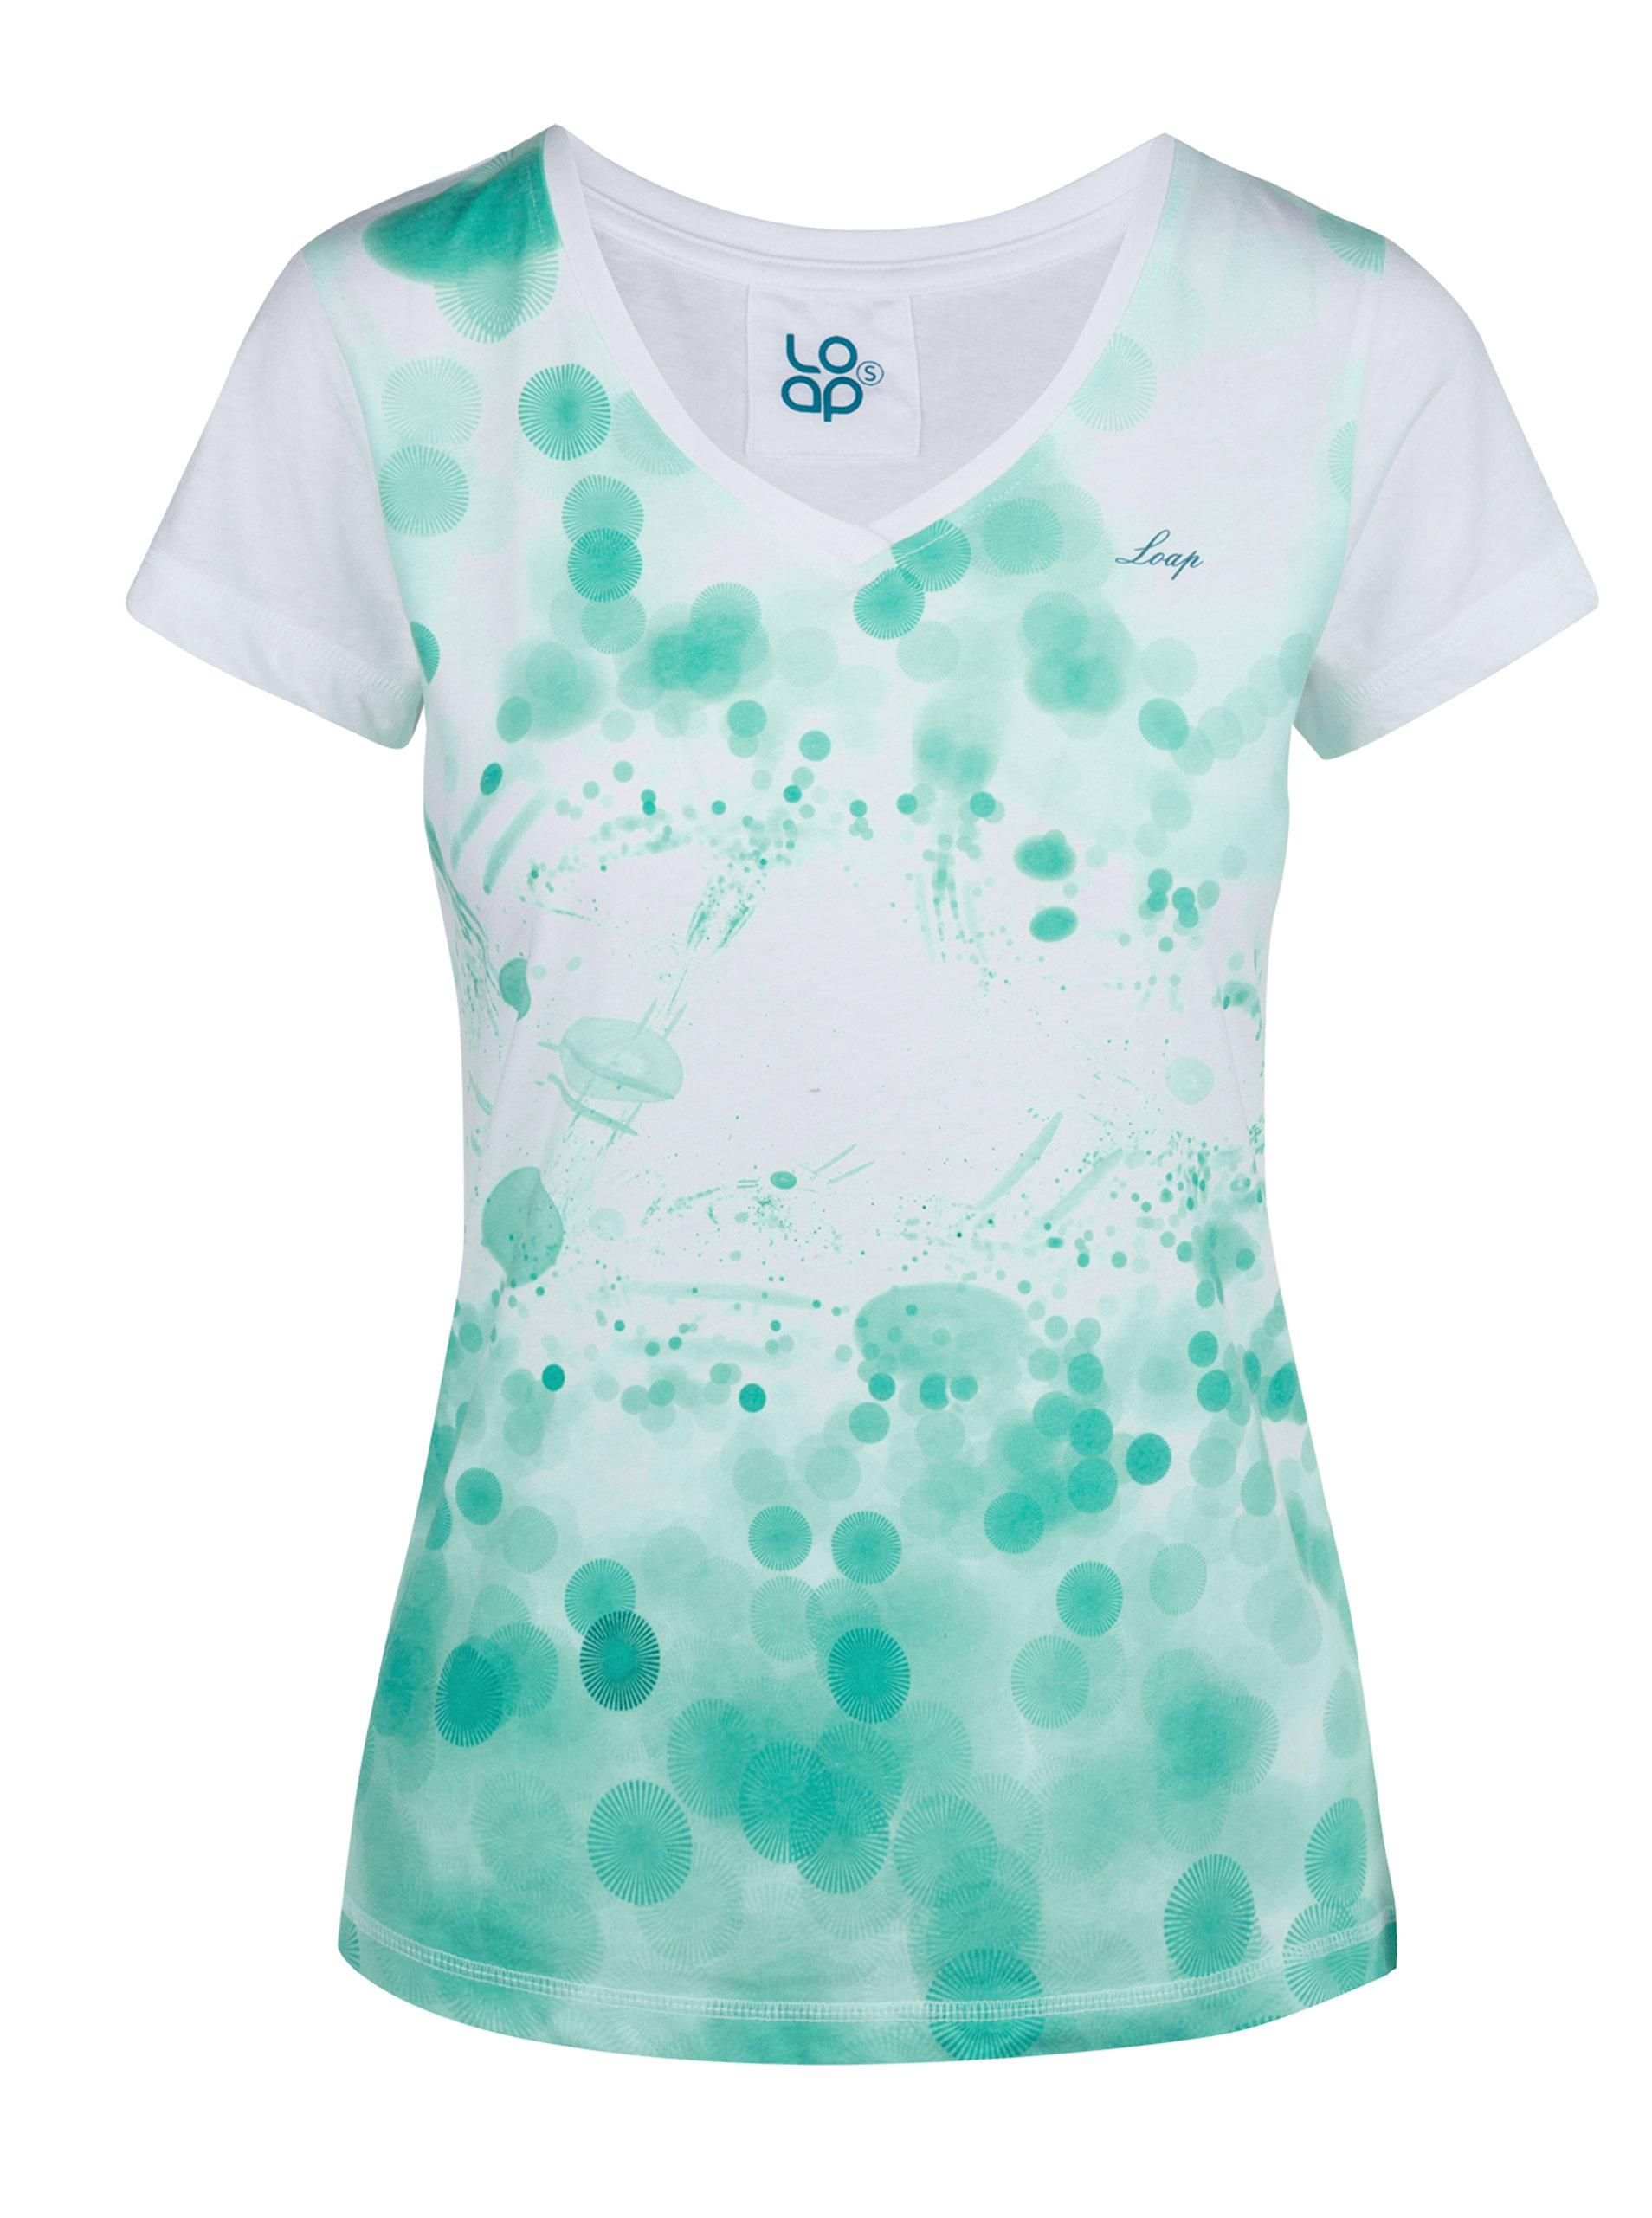 dedbde59ebea Zeleno-biele dámske tričko s potlačou LOAP Byblosa ...